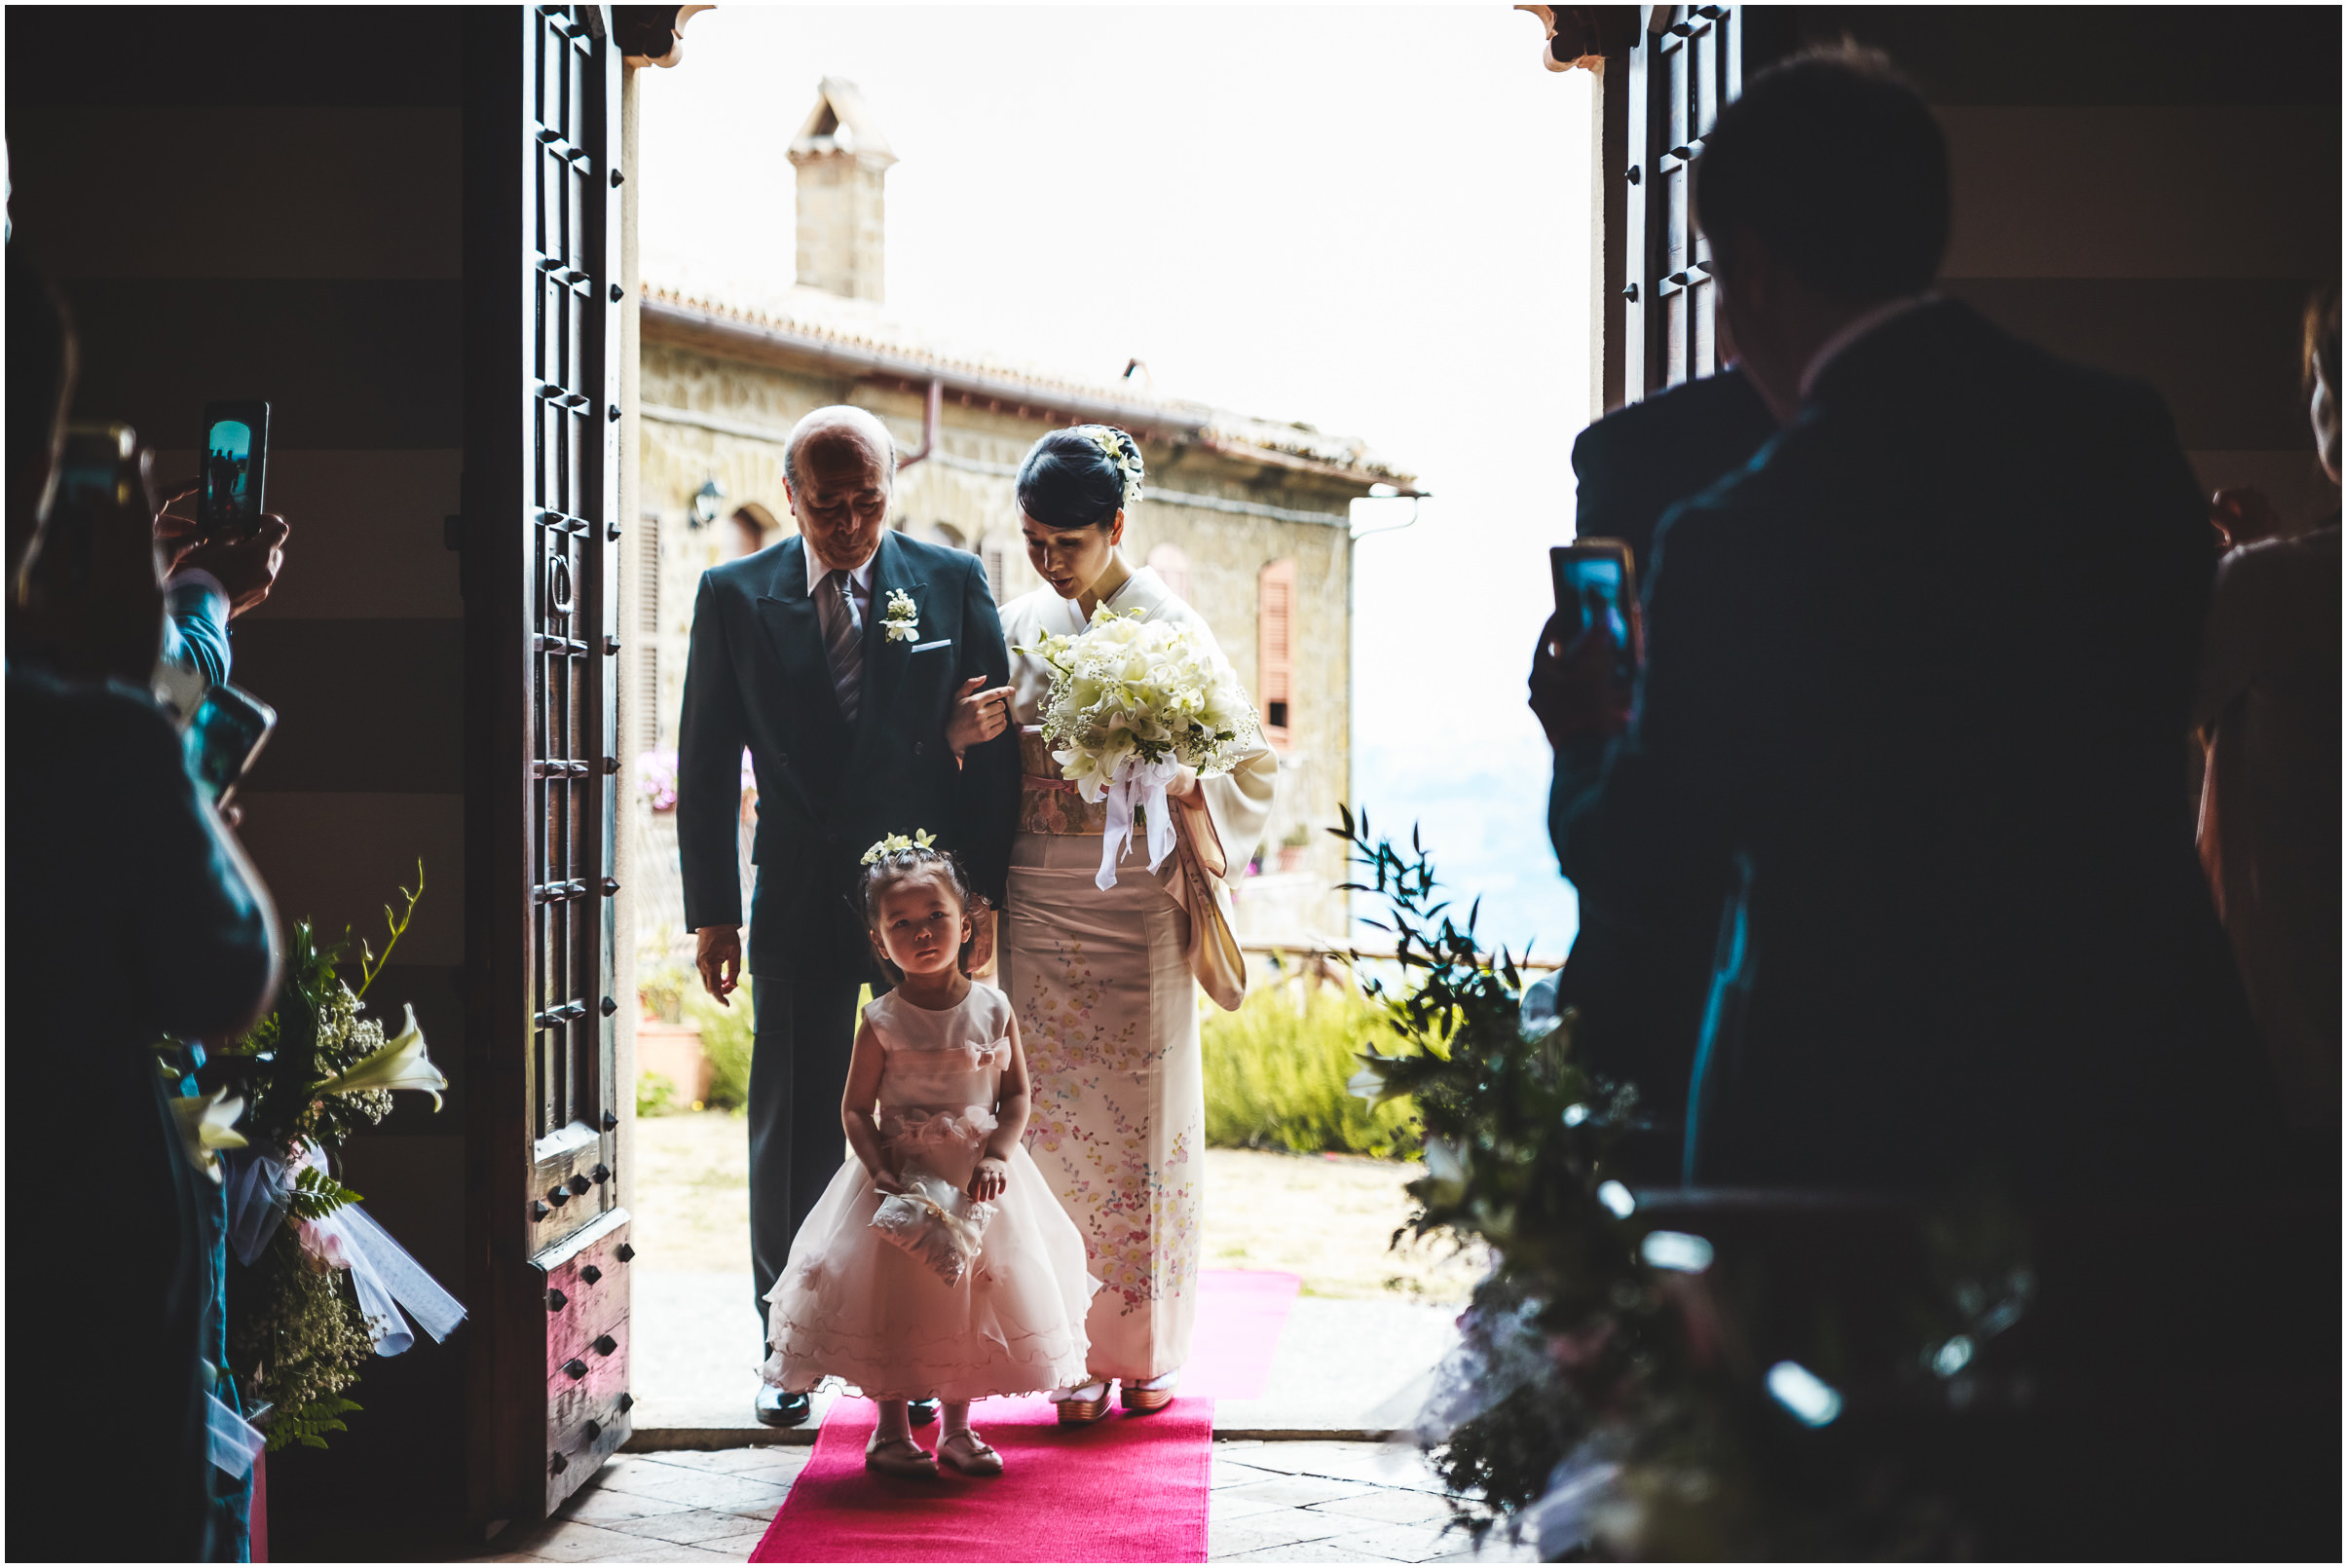 WEDDING-PHOTOGRAPHY-SARA-LORENZONI-FOTOGRAFIA-MATRIMONIO-ORVIETO-JUKA-ANTONELLO08